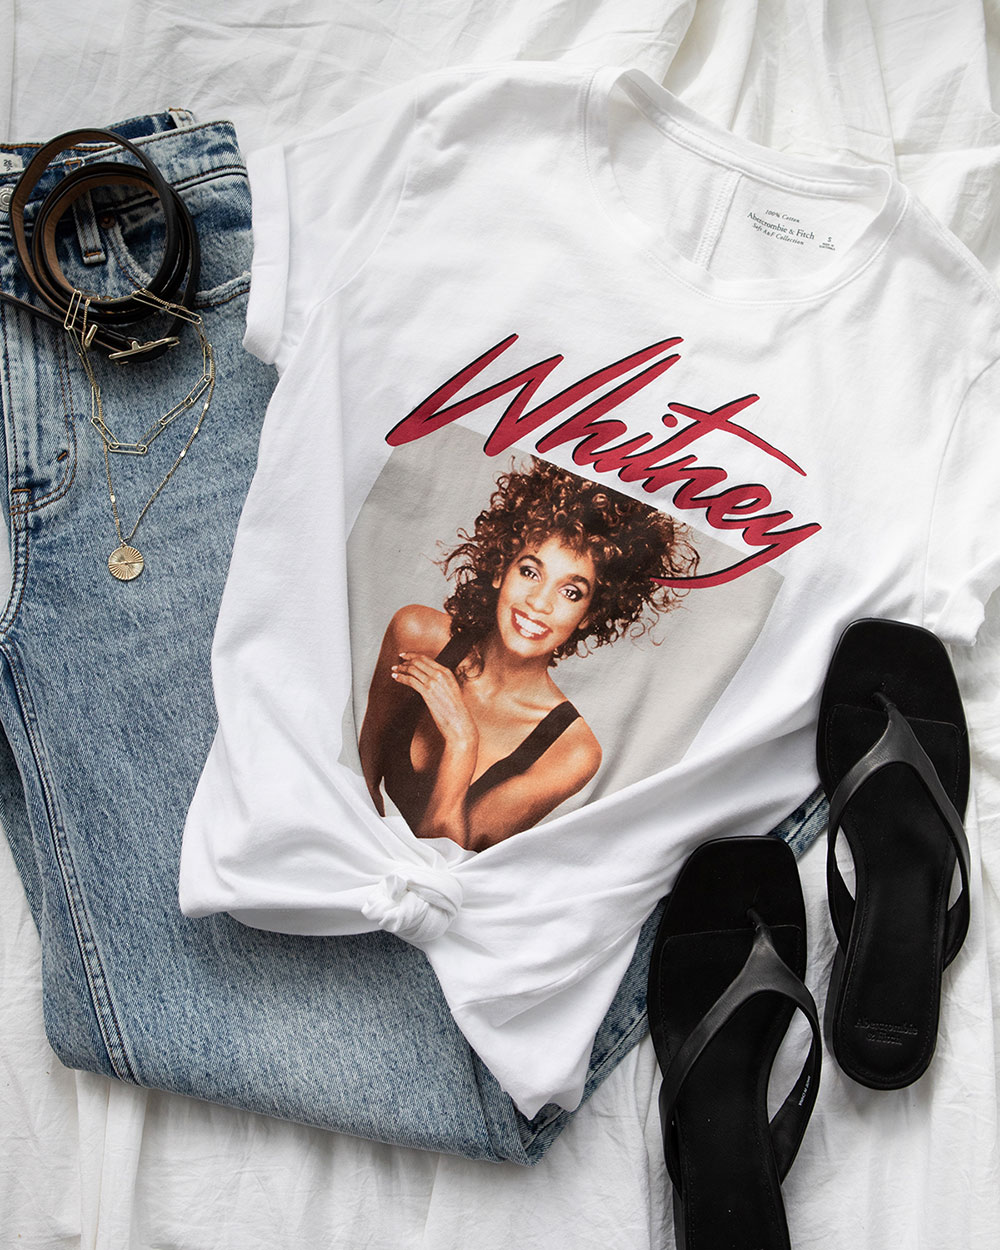 Whitney Houston Abercrombie & Fitch tee shirt